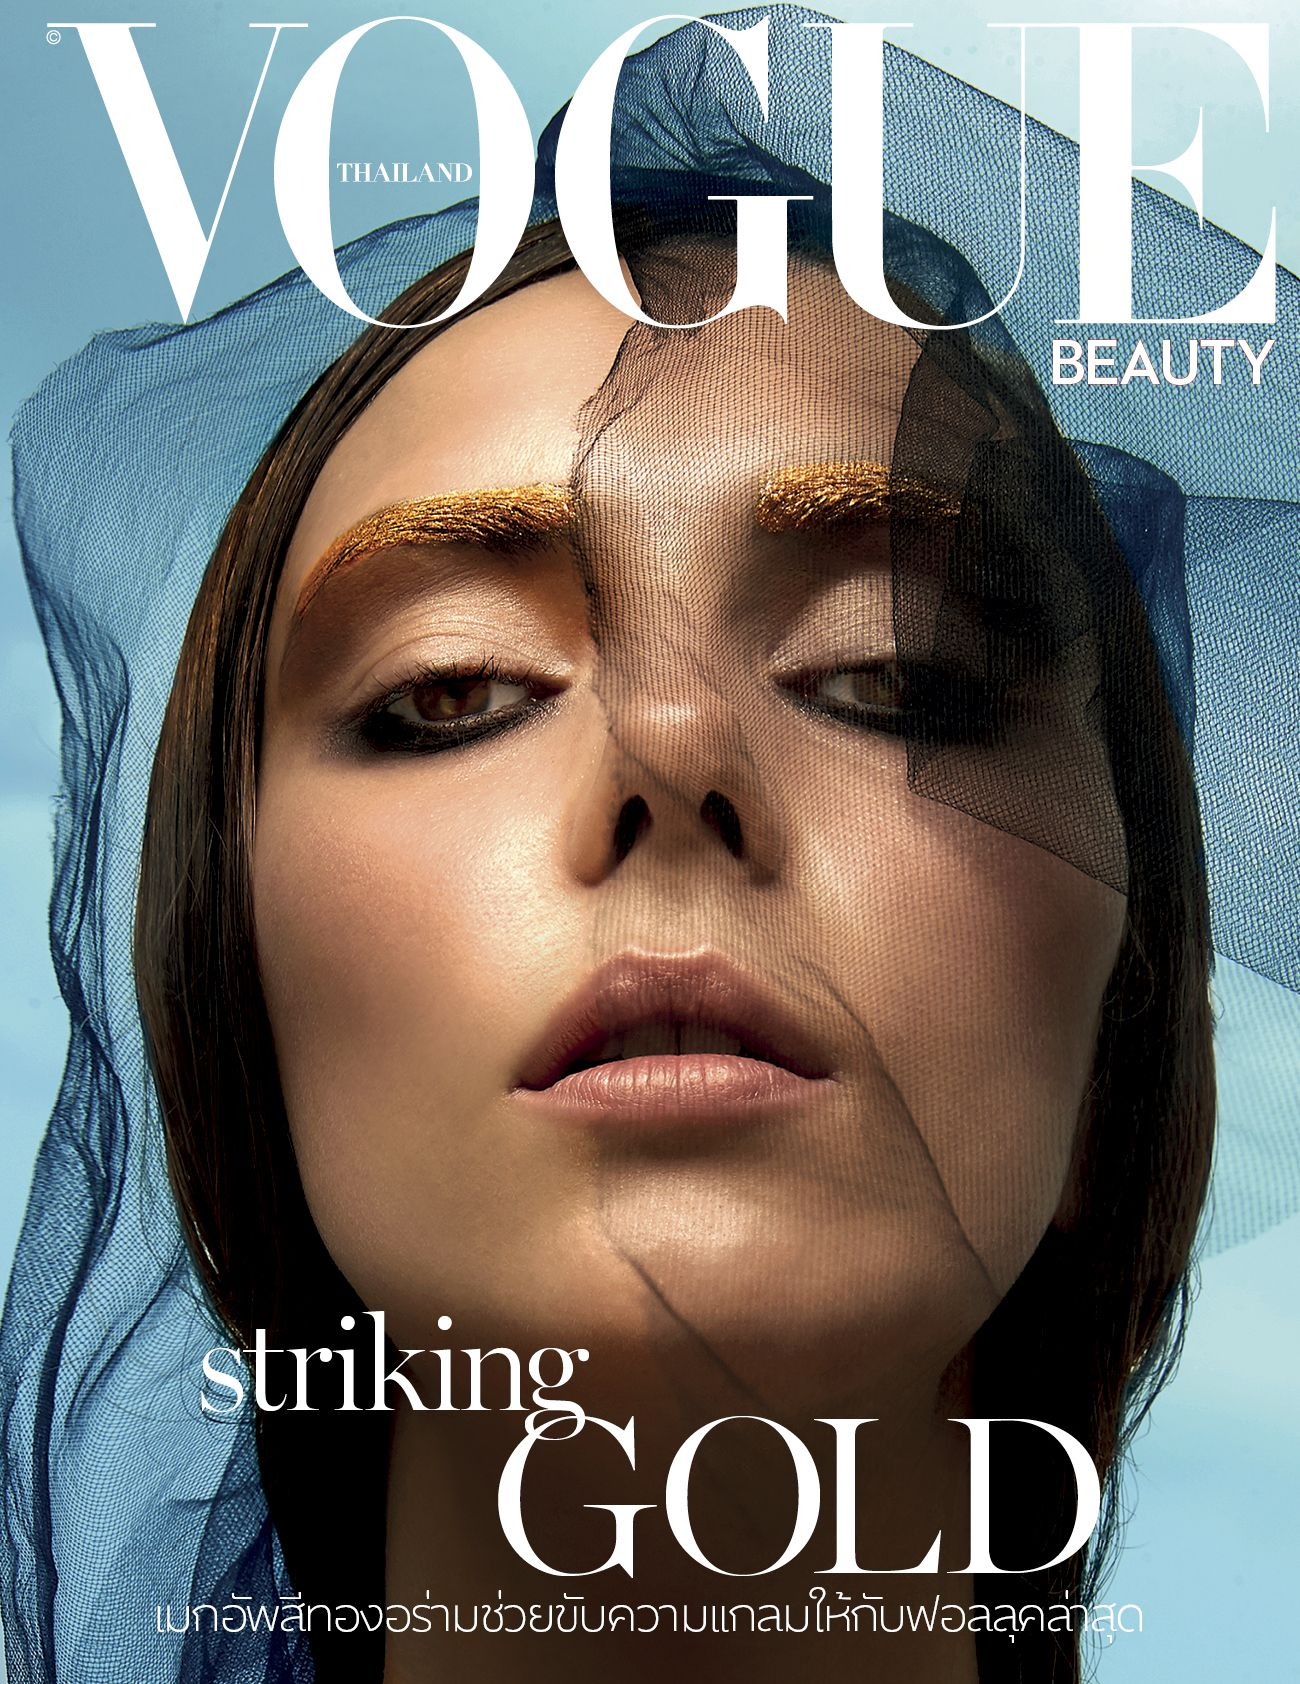 Voguethailand Beauty Magazine Cover Design Vogue Covers